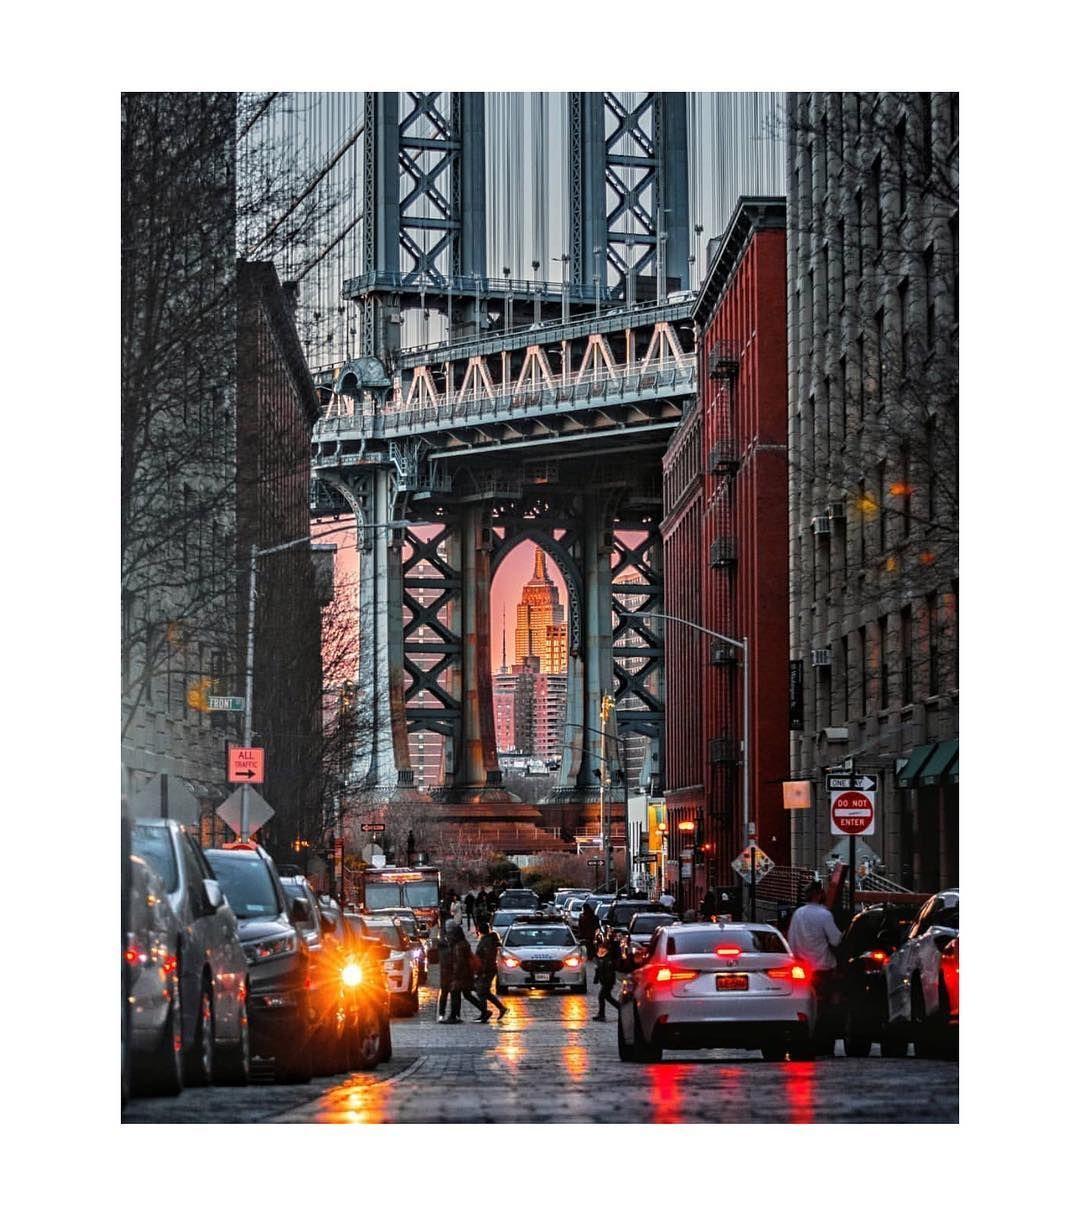 Nyc Cityscape Lensblr Photography Tumblr Aesthetic Newyork Brooklyn Manhattan Us Nyc Cityscape Lensblr Photography T New York Life New York Nyc